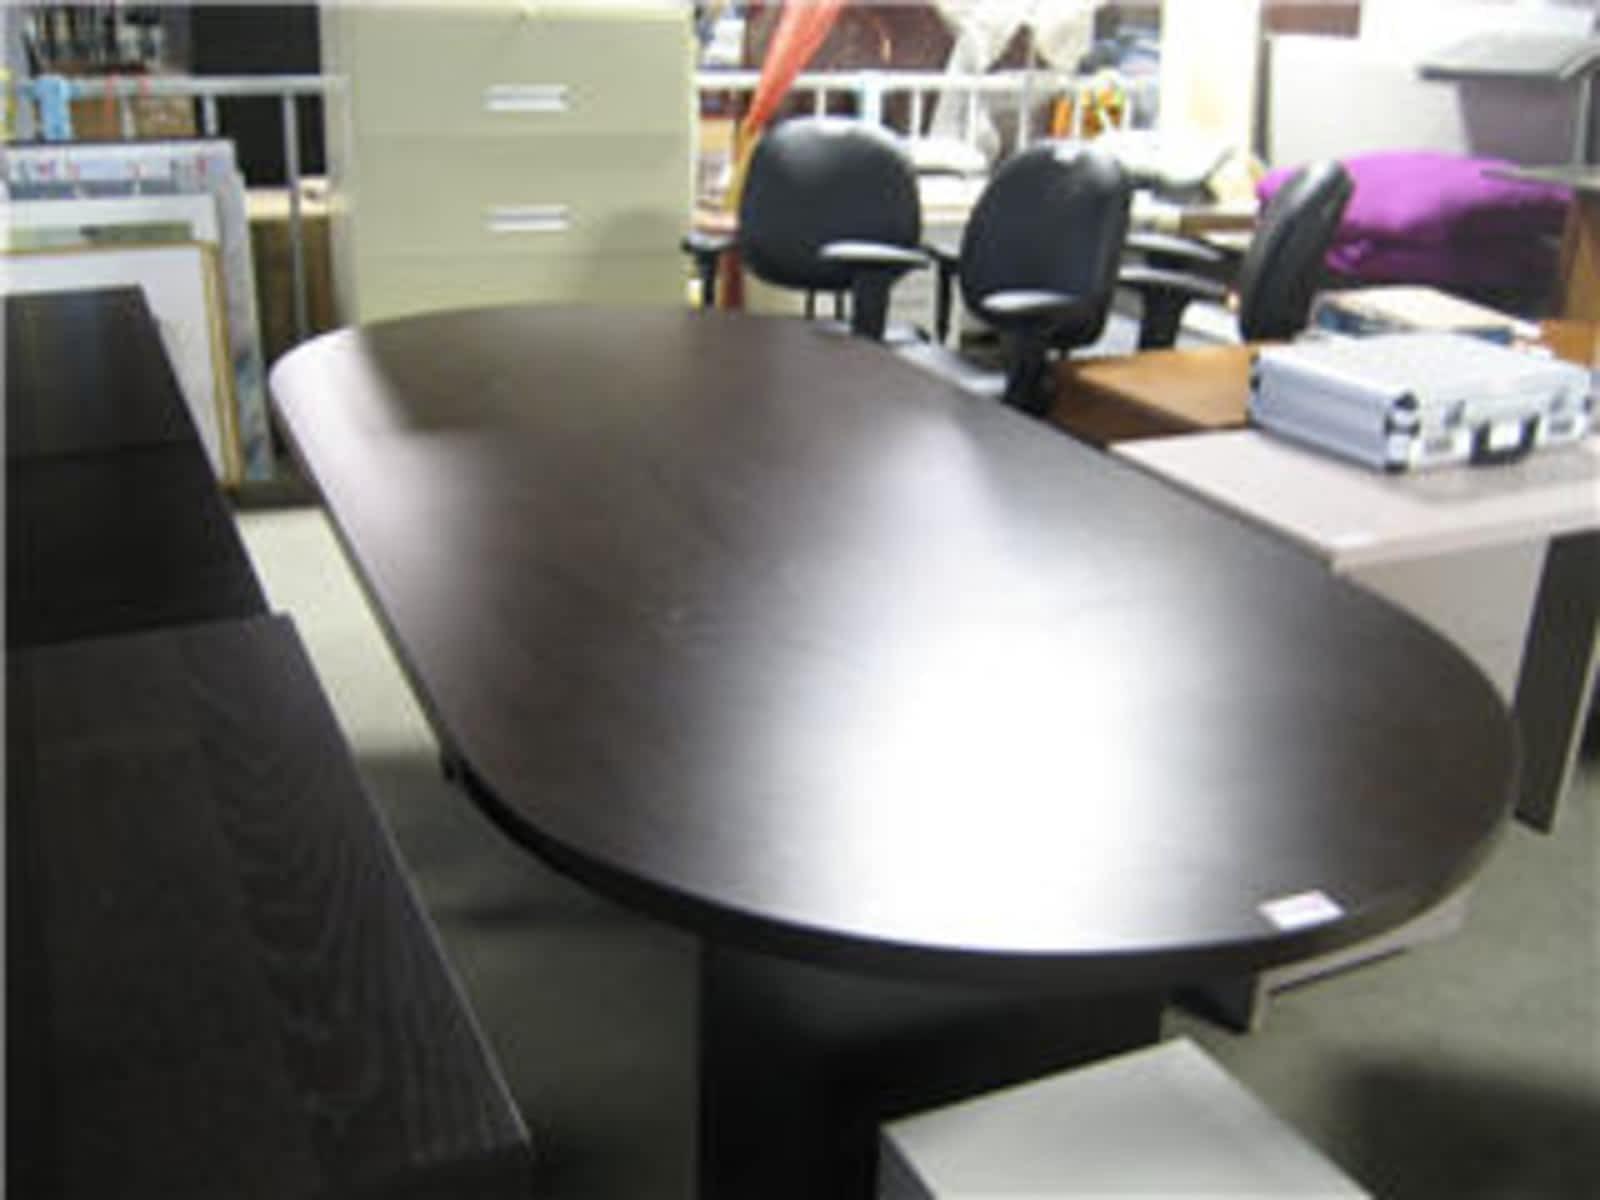 67 Office Furniture 170 Street Edmonton G D Liquidators Photo Of Pottery Barn New